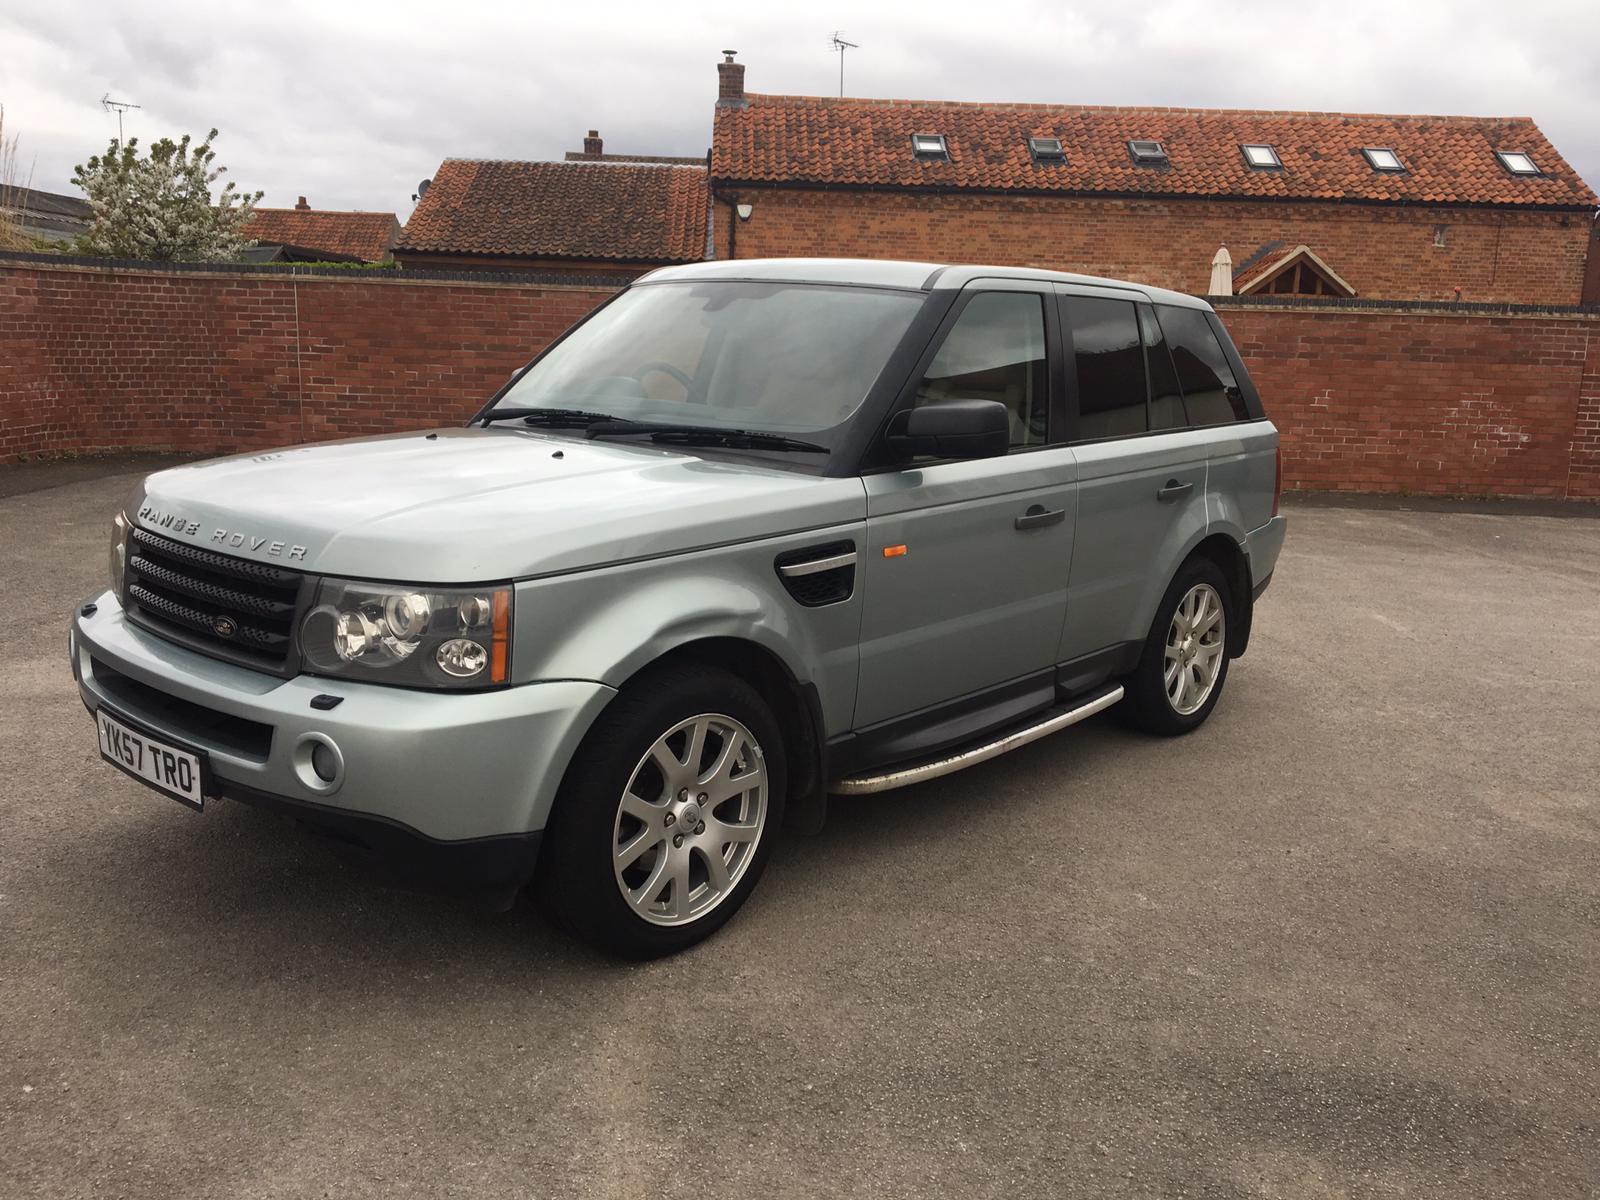 Lot 19 - Range Rover Sport 2.7 TD V6 SE